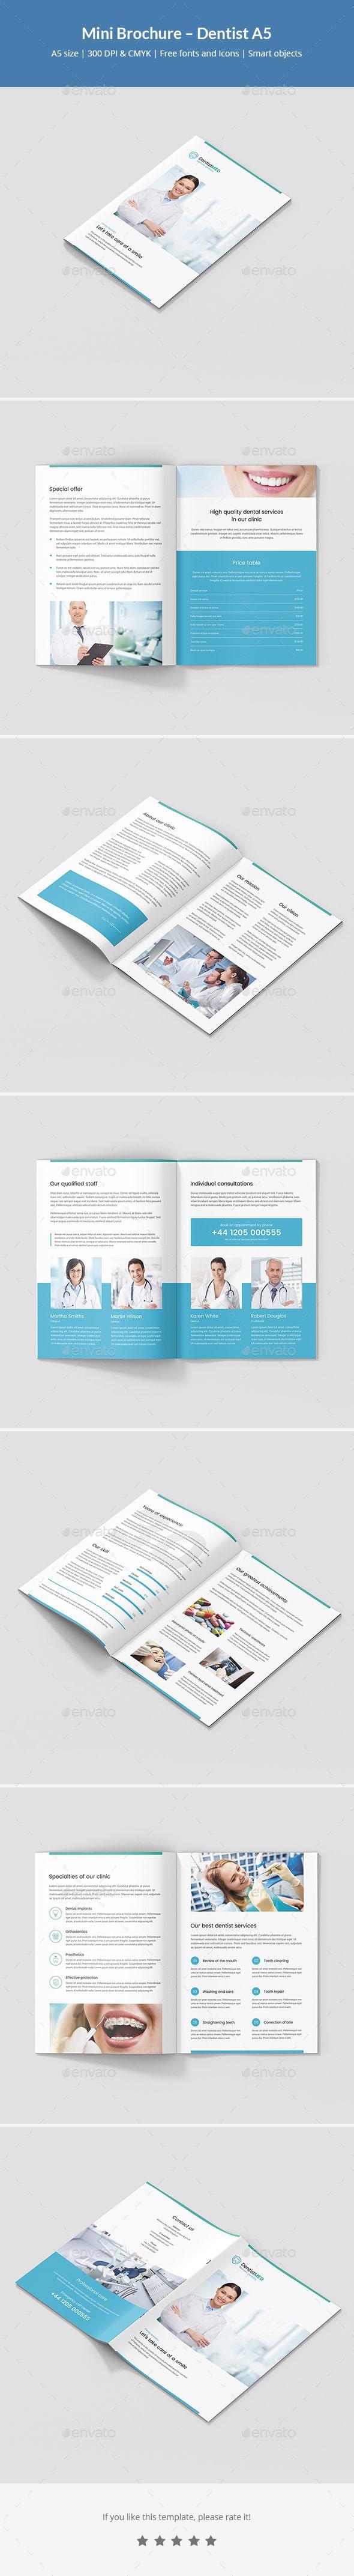 Mini Brochure Dentist A5 Brochures Brochure Template And A5